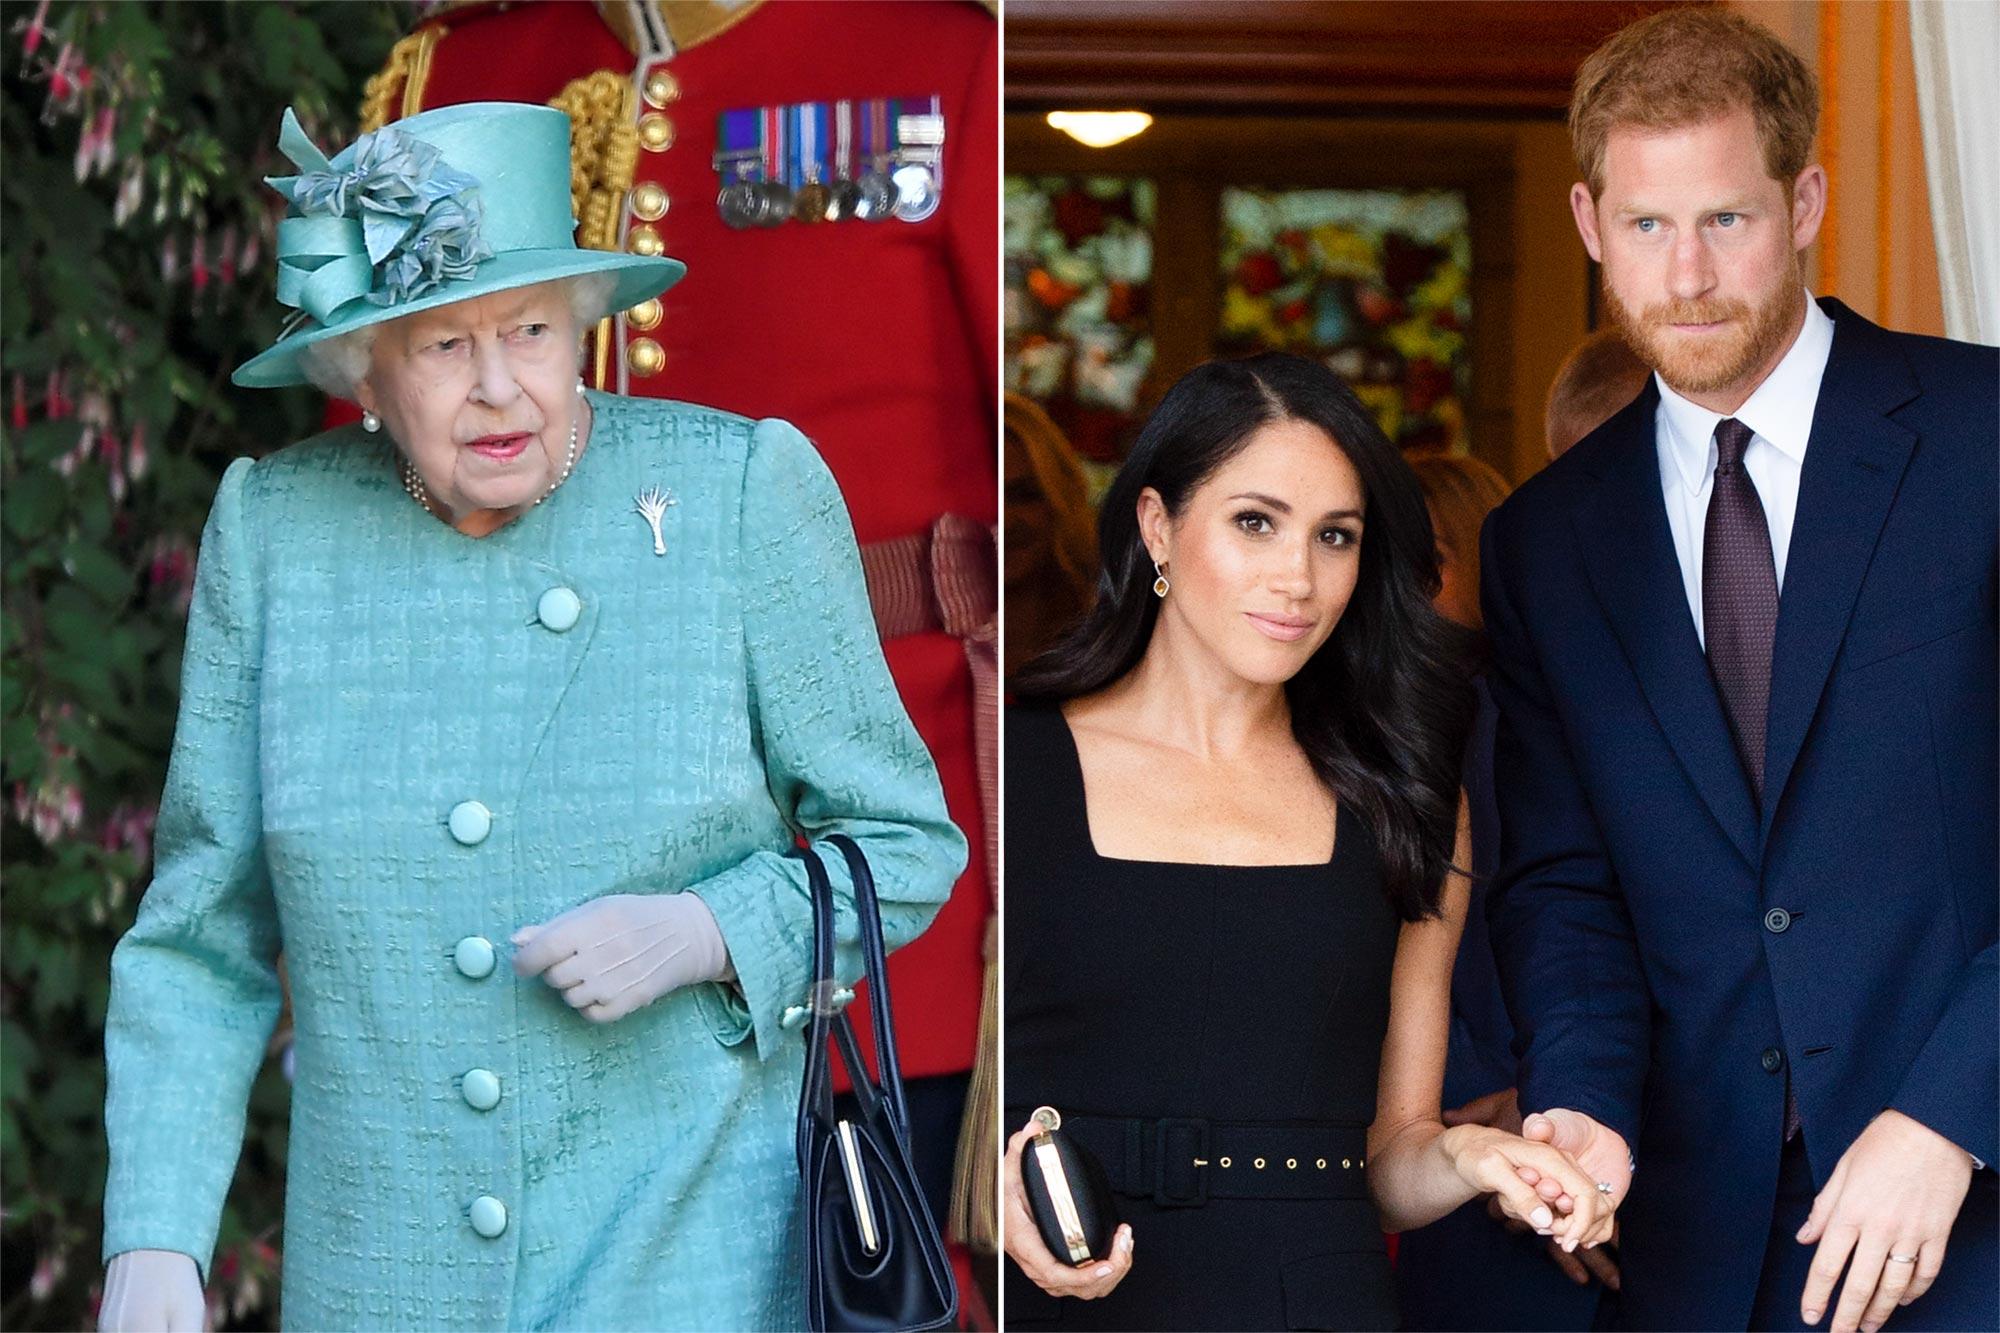 Queen Elizabeth II, Prince Harry and Meghan Markle